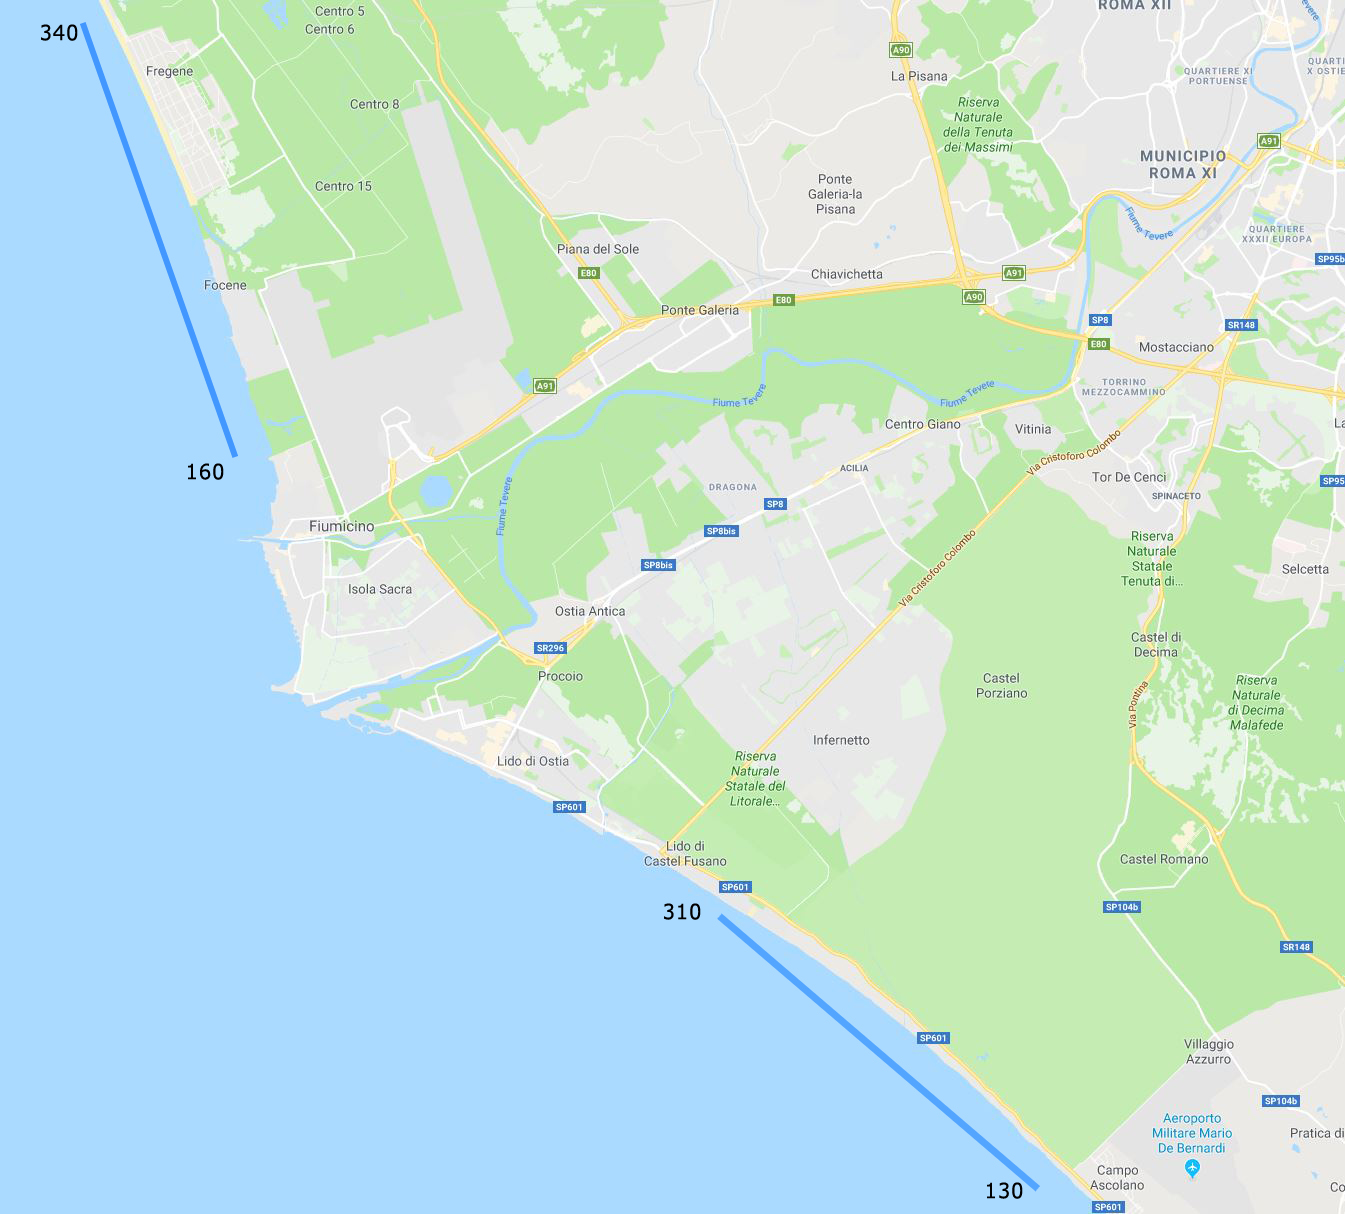 Ostia-Fiumicino